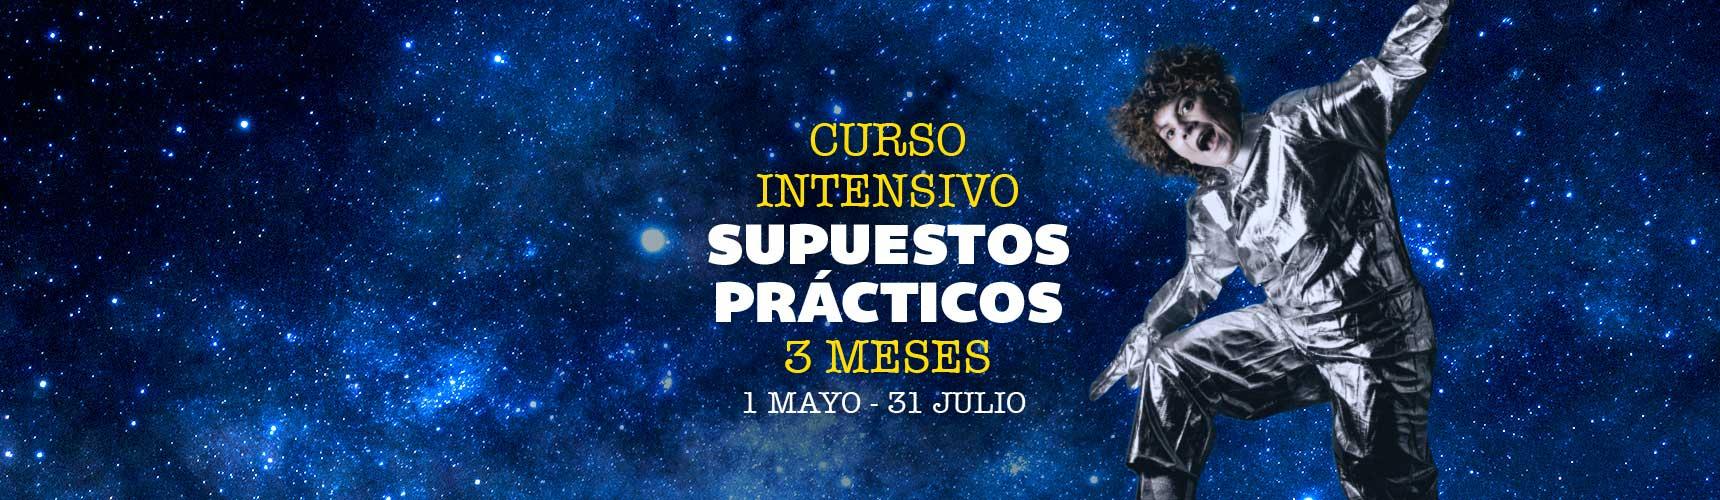 3meses_SUP_Pupitre_cursos_portada-web_nuevas-fotos_1720x910-NEW